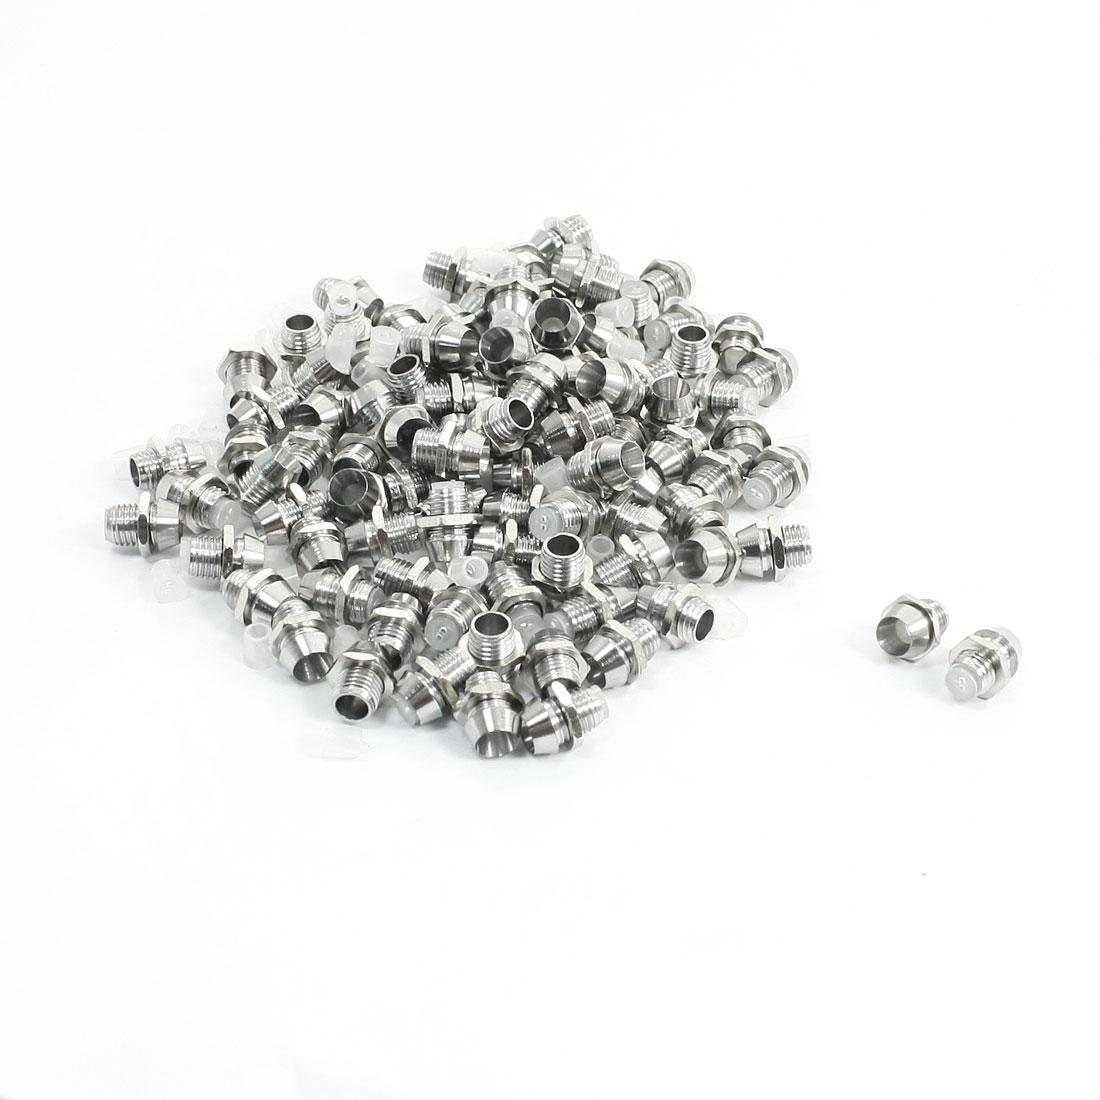 100 Pcs Silver Tone LED Lamp Holder Bezels for 3mm Light Emitting Diode